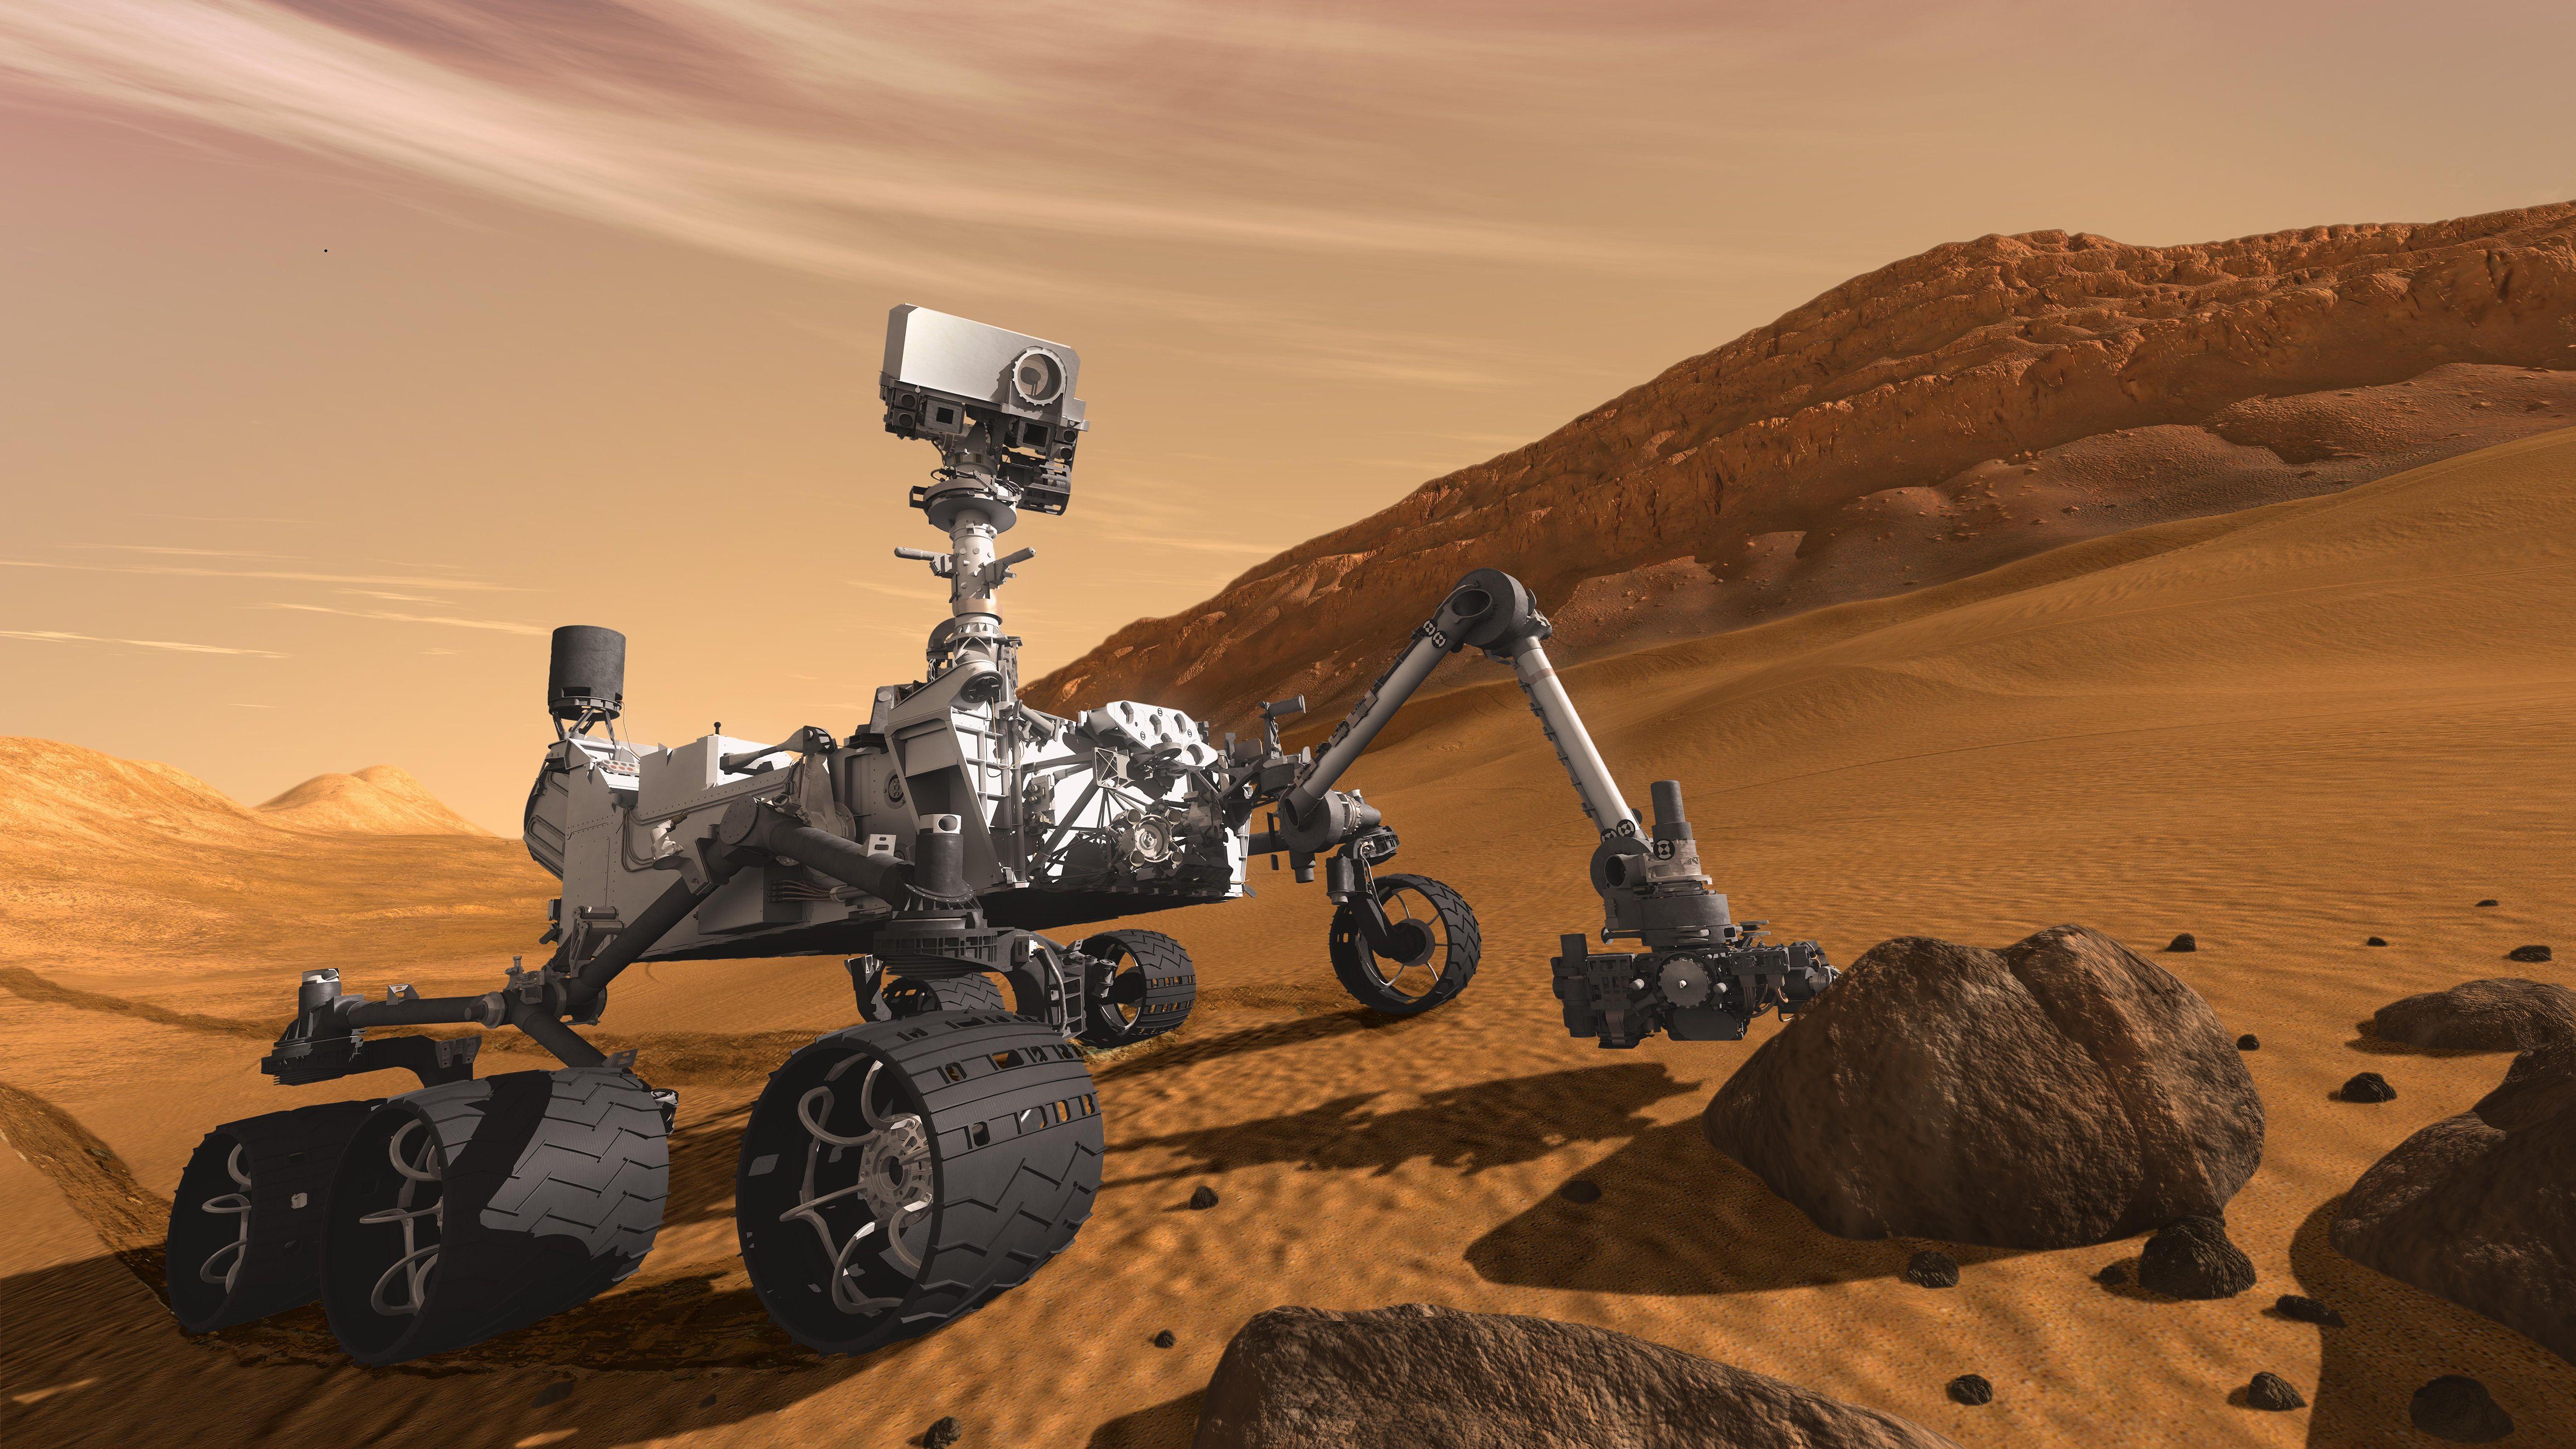 Mars Curiosity Rover Newsdesk Curiosity Rover Mars Science Laboratory Nasa Mars